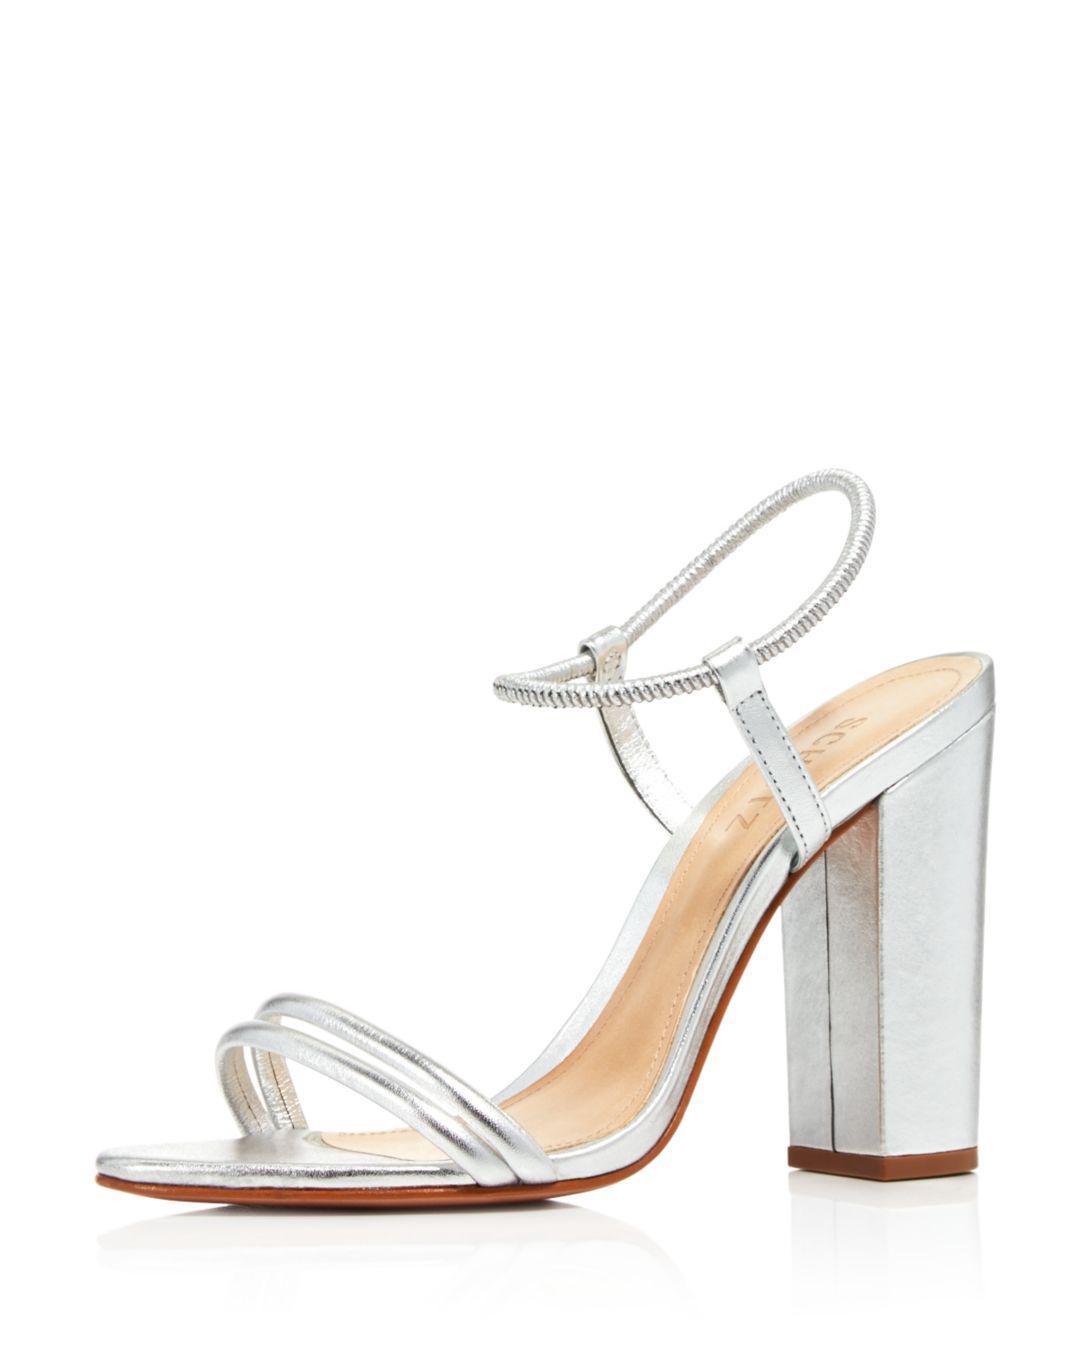 cdc5a5933370 Lyst - Schutz Women s Pincesa Metallic High-heel Sandals in Metallic